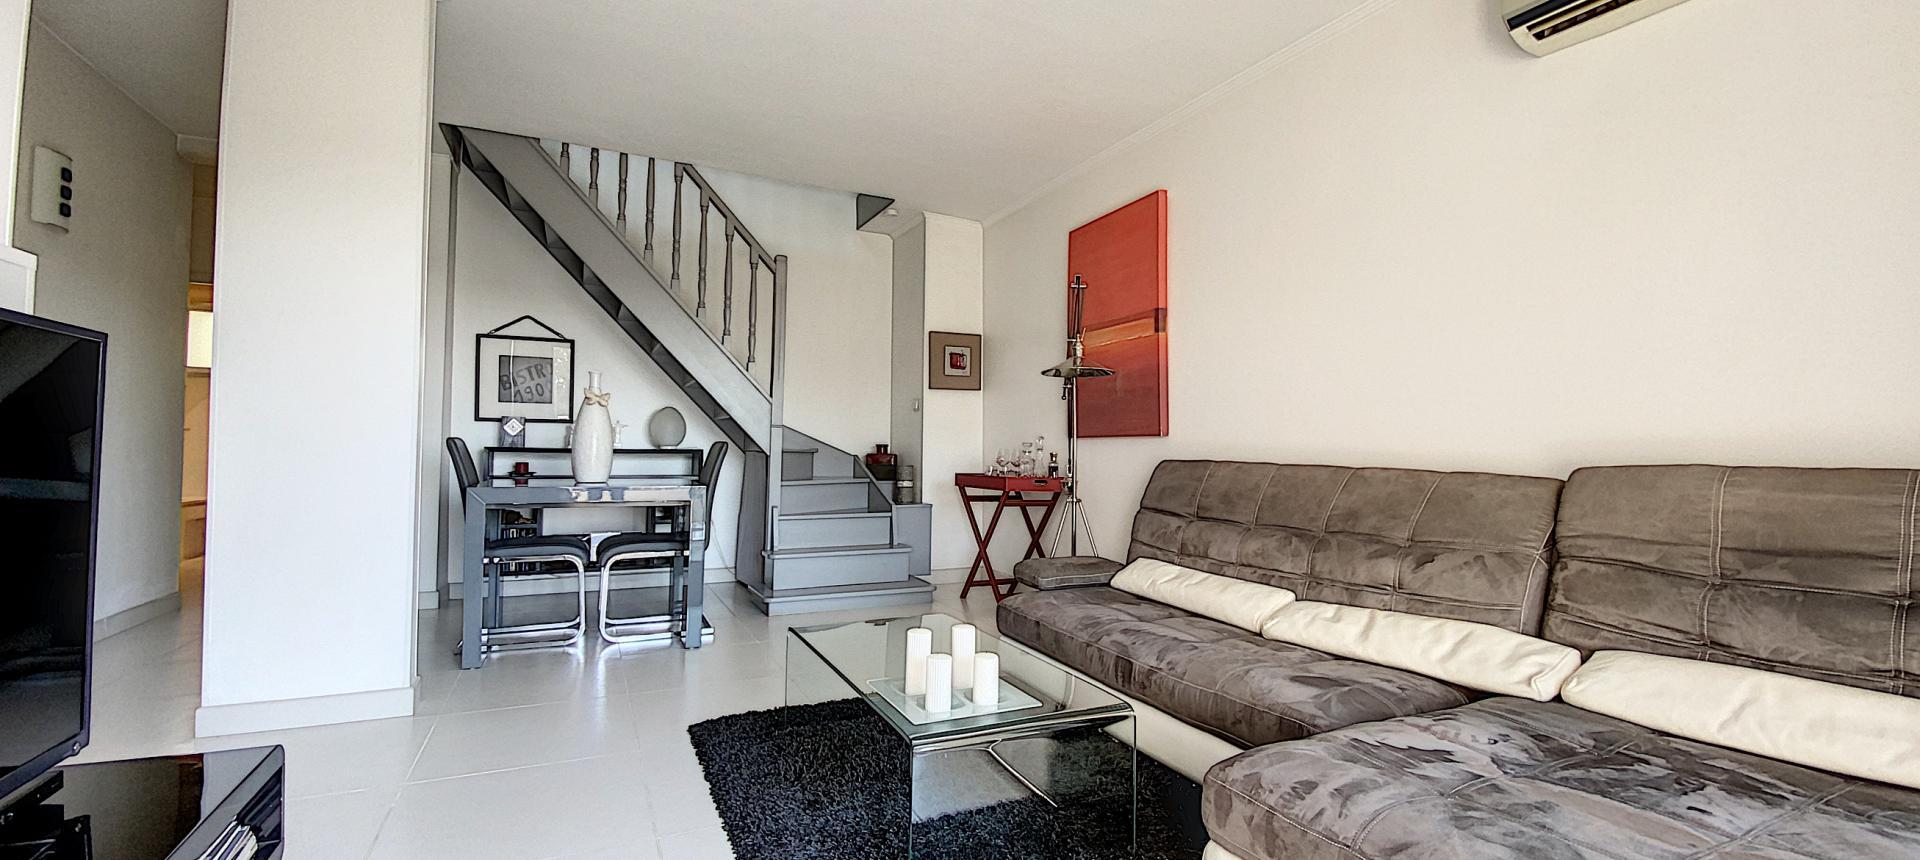 vente appartement F3 duplex ajaccio séjour escalier